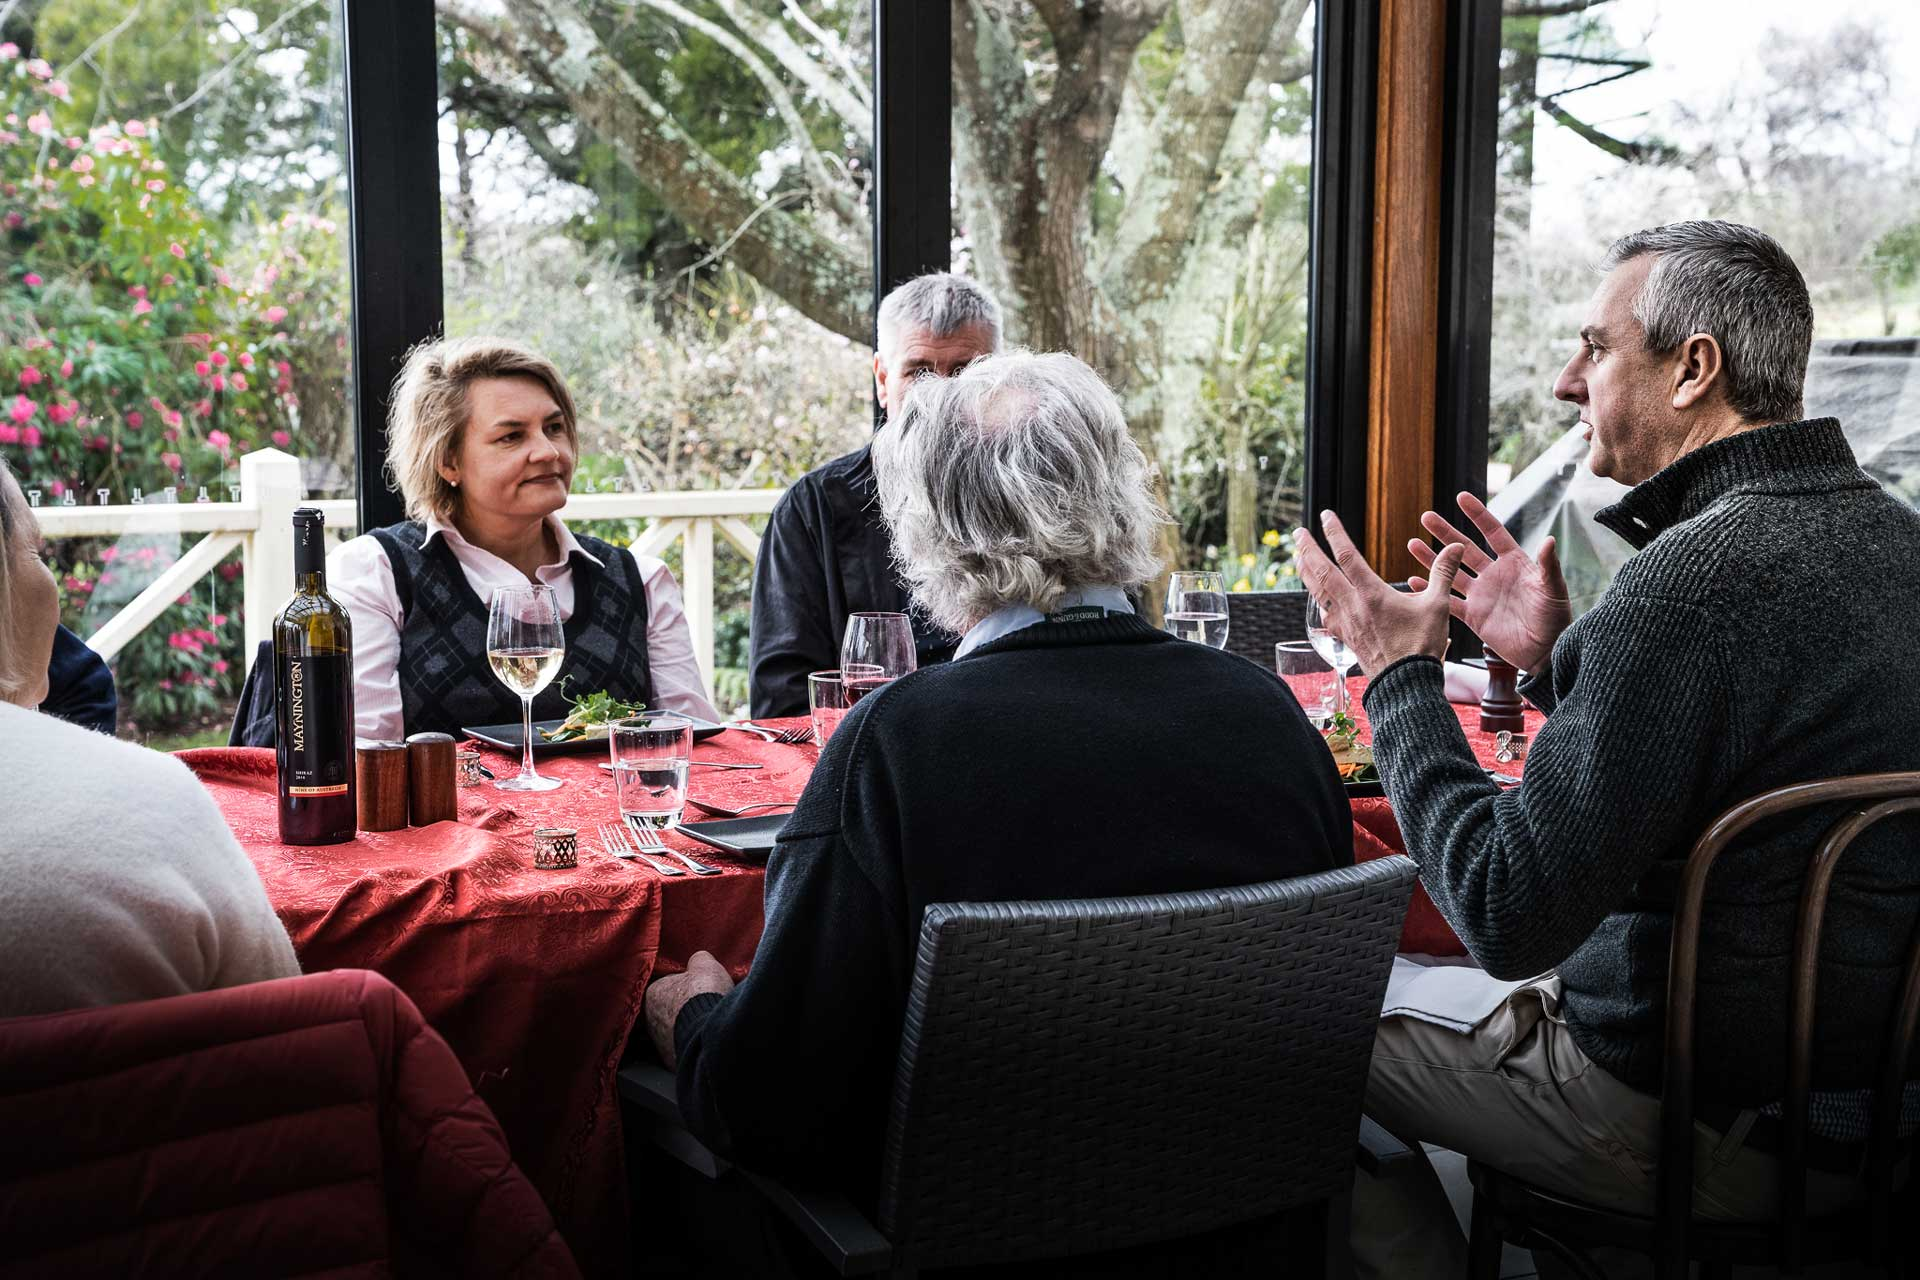 Glencoe Country B&B visitors enjoying food and wine